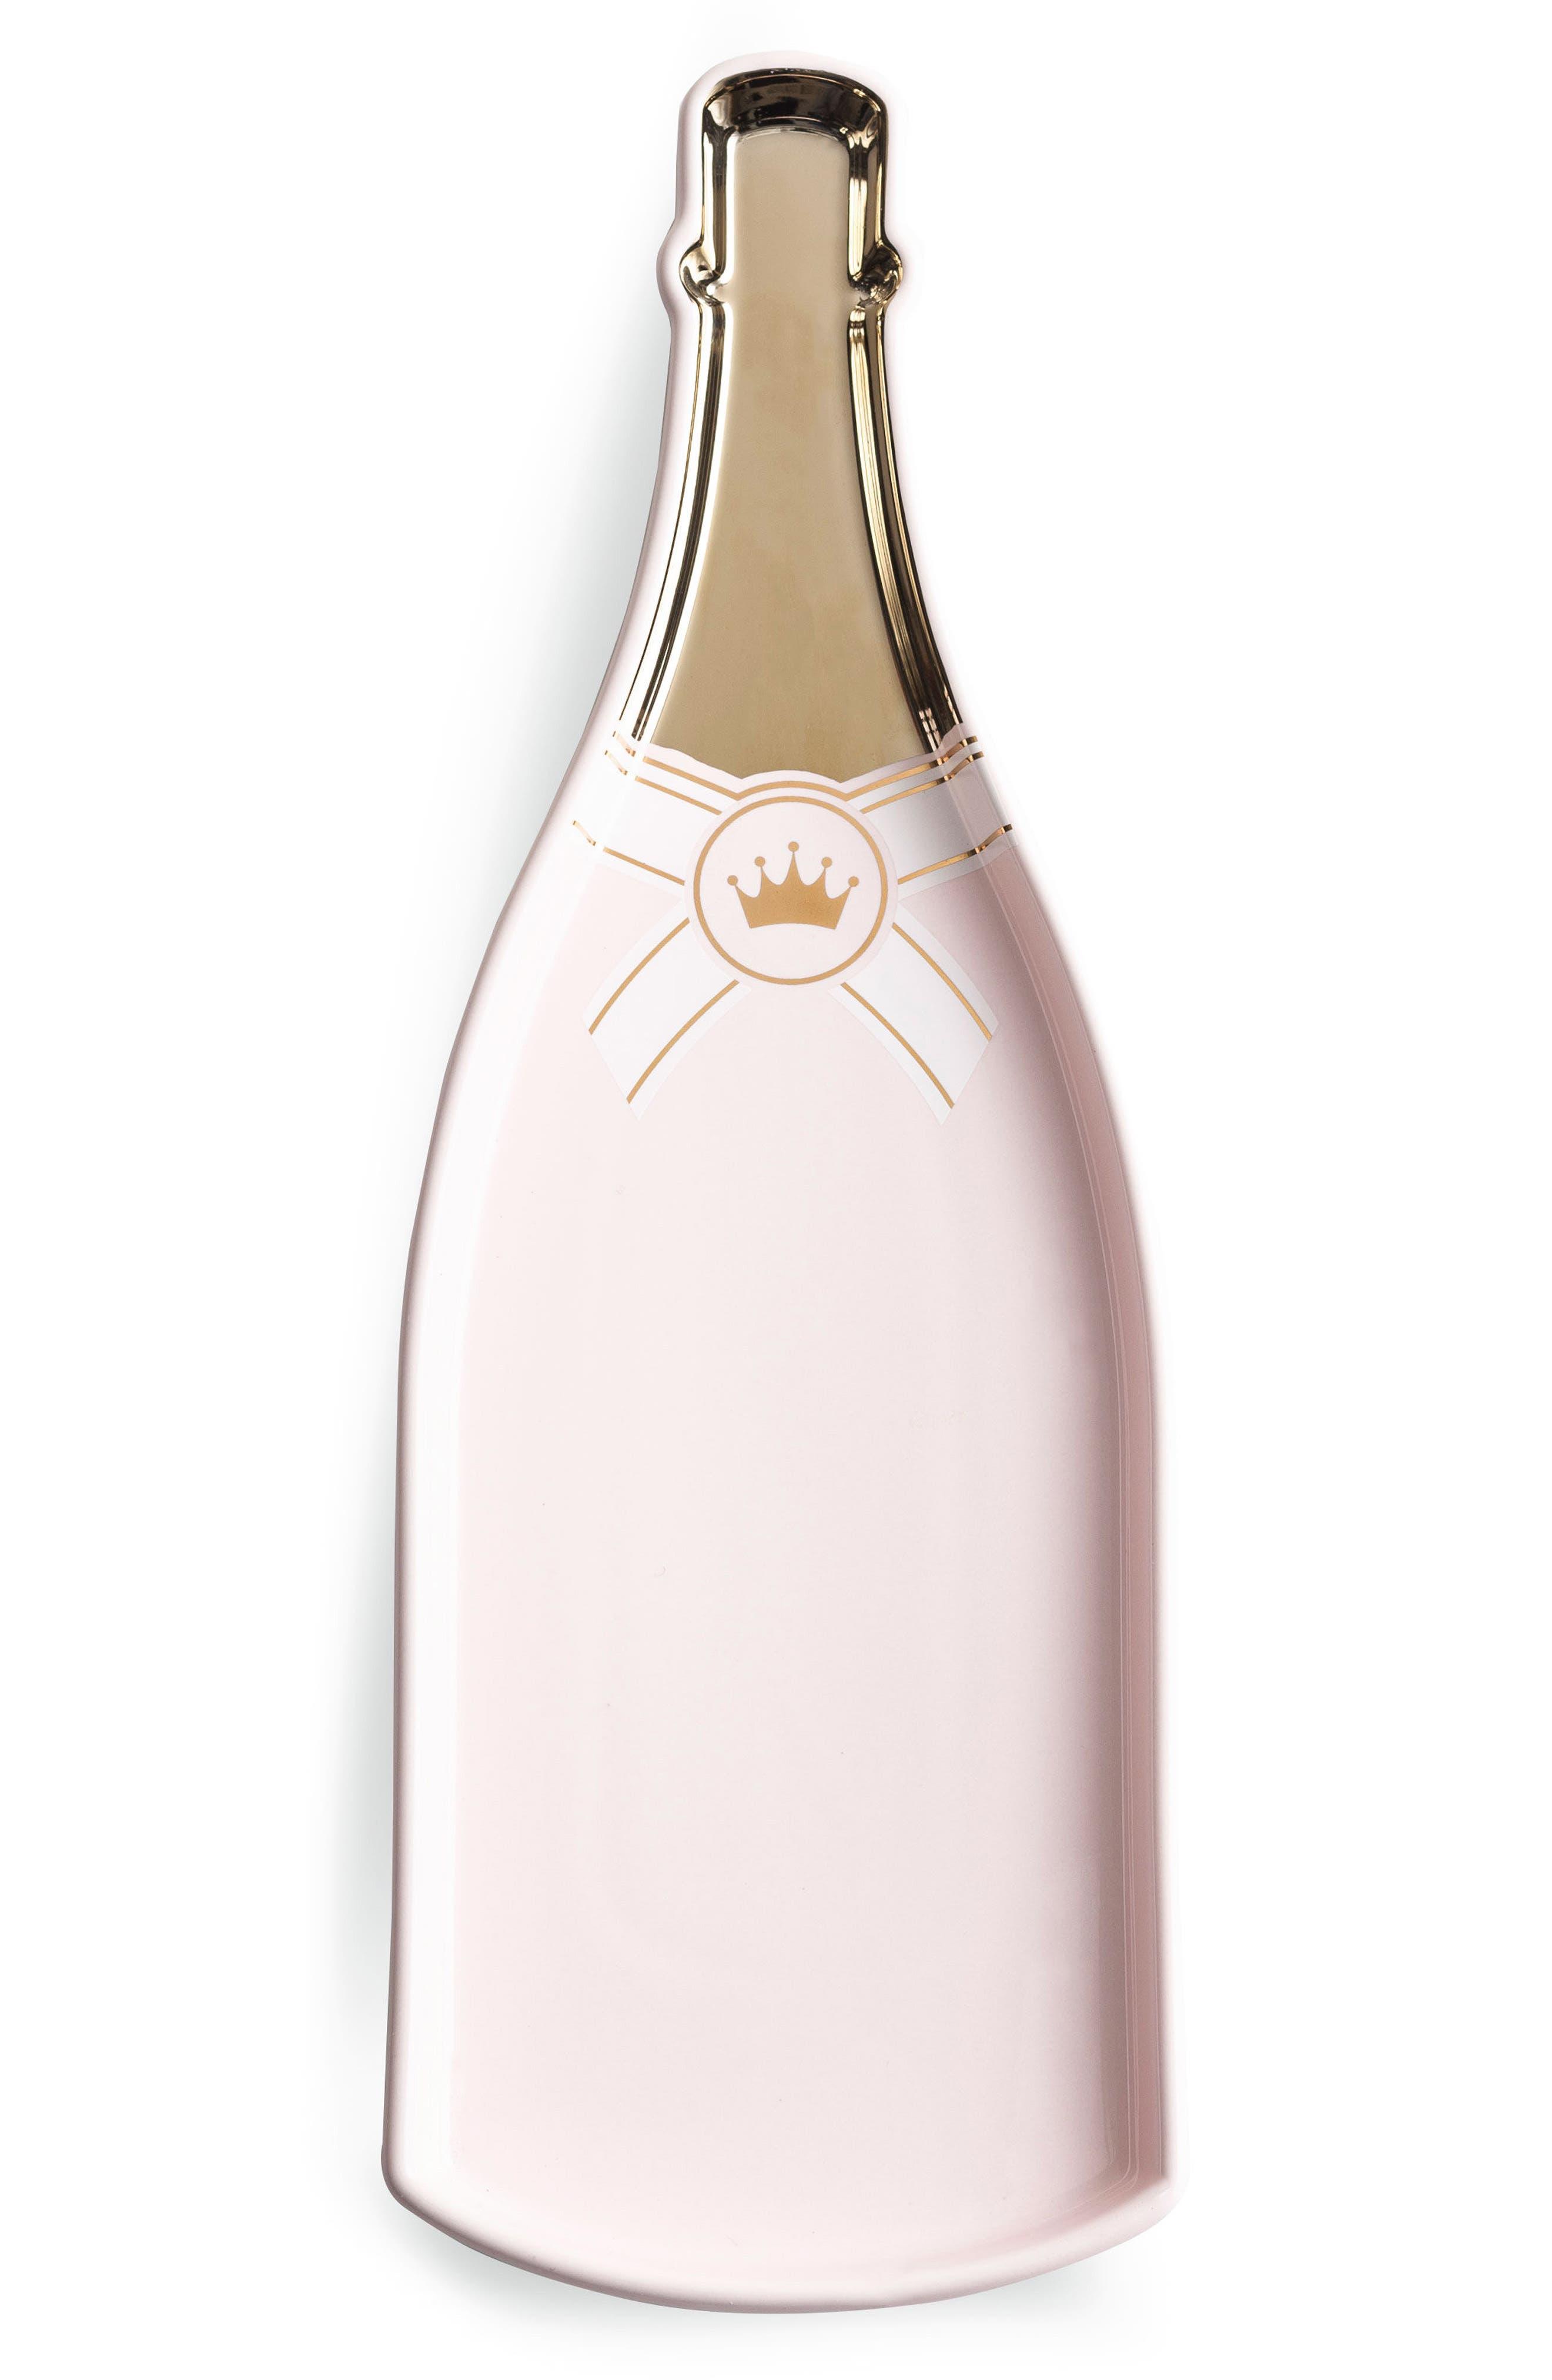 Main Image - Rosanna Champagne Bottle Serving Tray